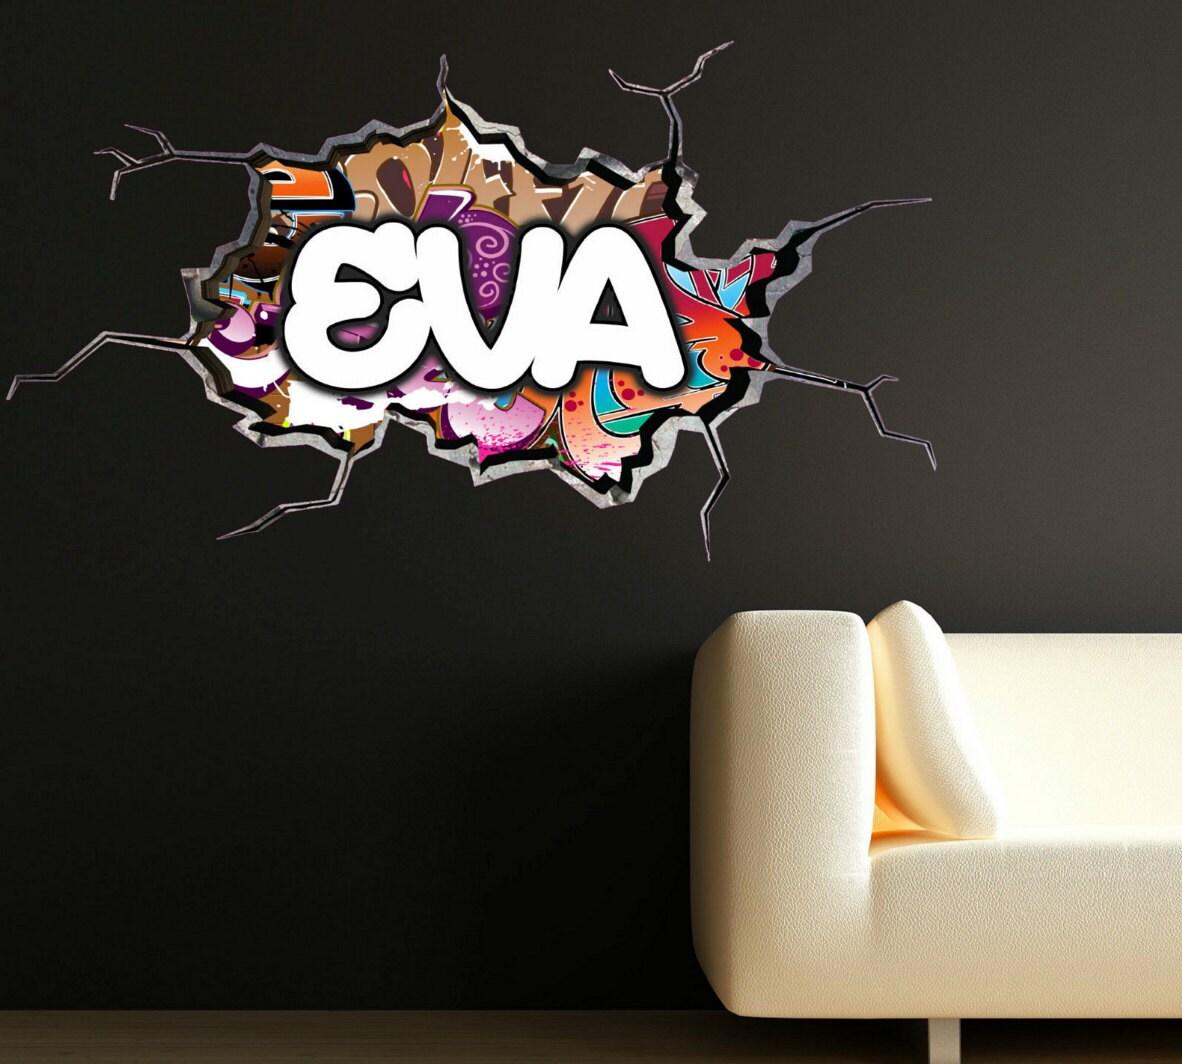 Personnalis Graffiti Pr Nom Sticker Fissur Mur 3d Vinyle Mur